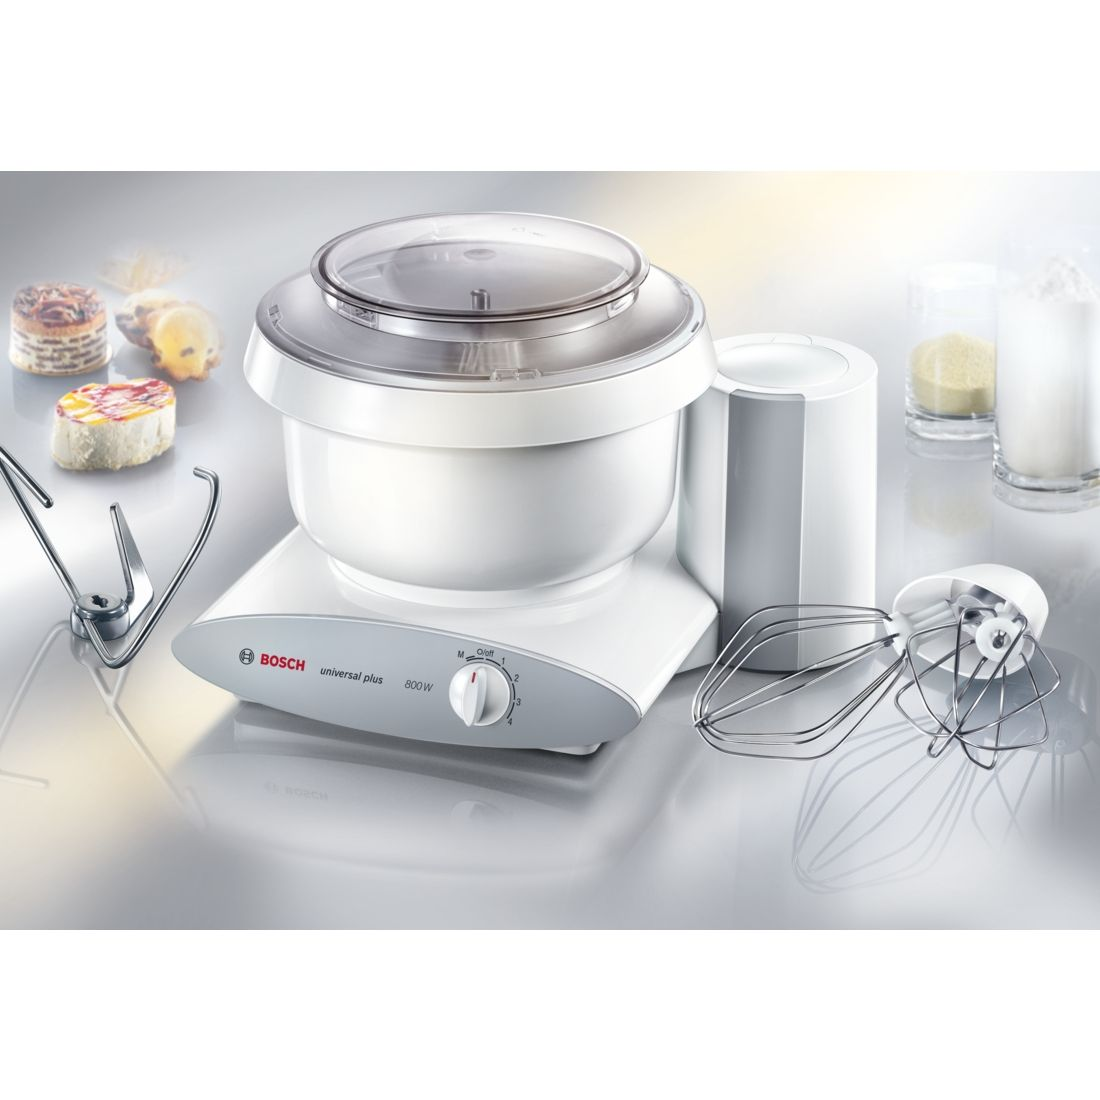 Bosch mixer MUM6N10UC | Standing mixer | Food processor ...